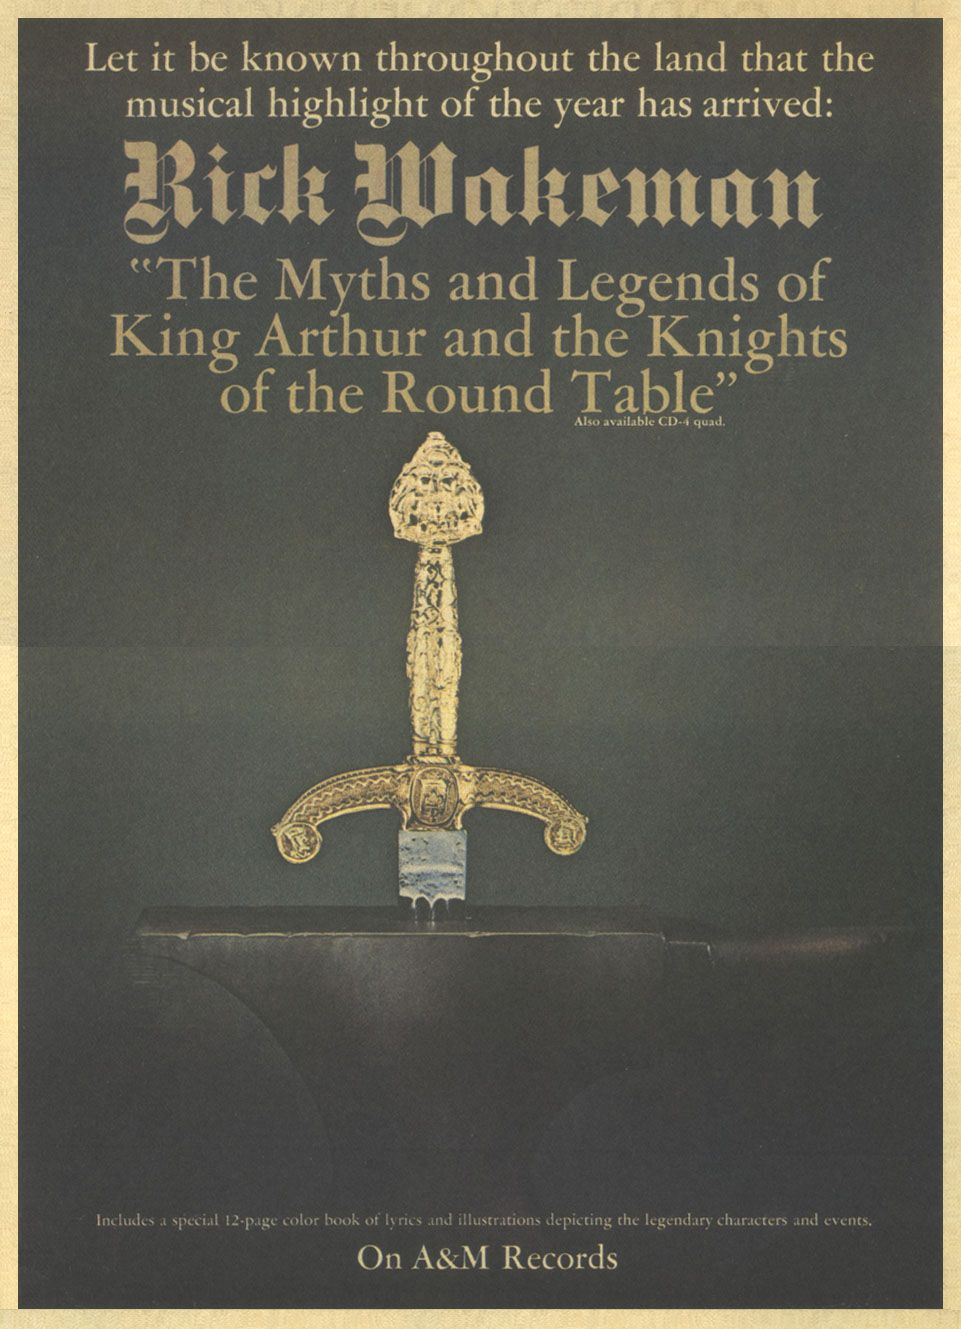 Rick Wakeman The Myths And Legends Of King Arthur Musica